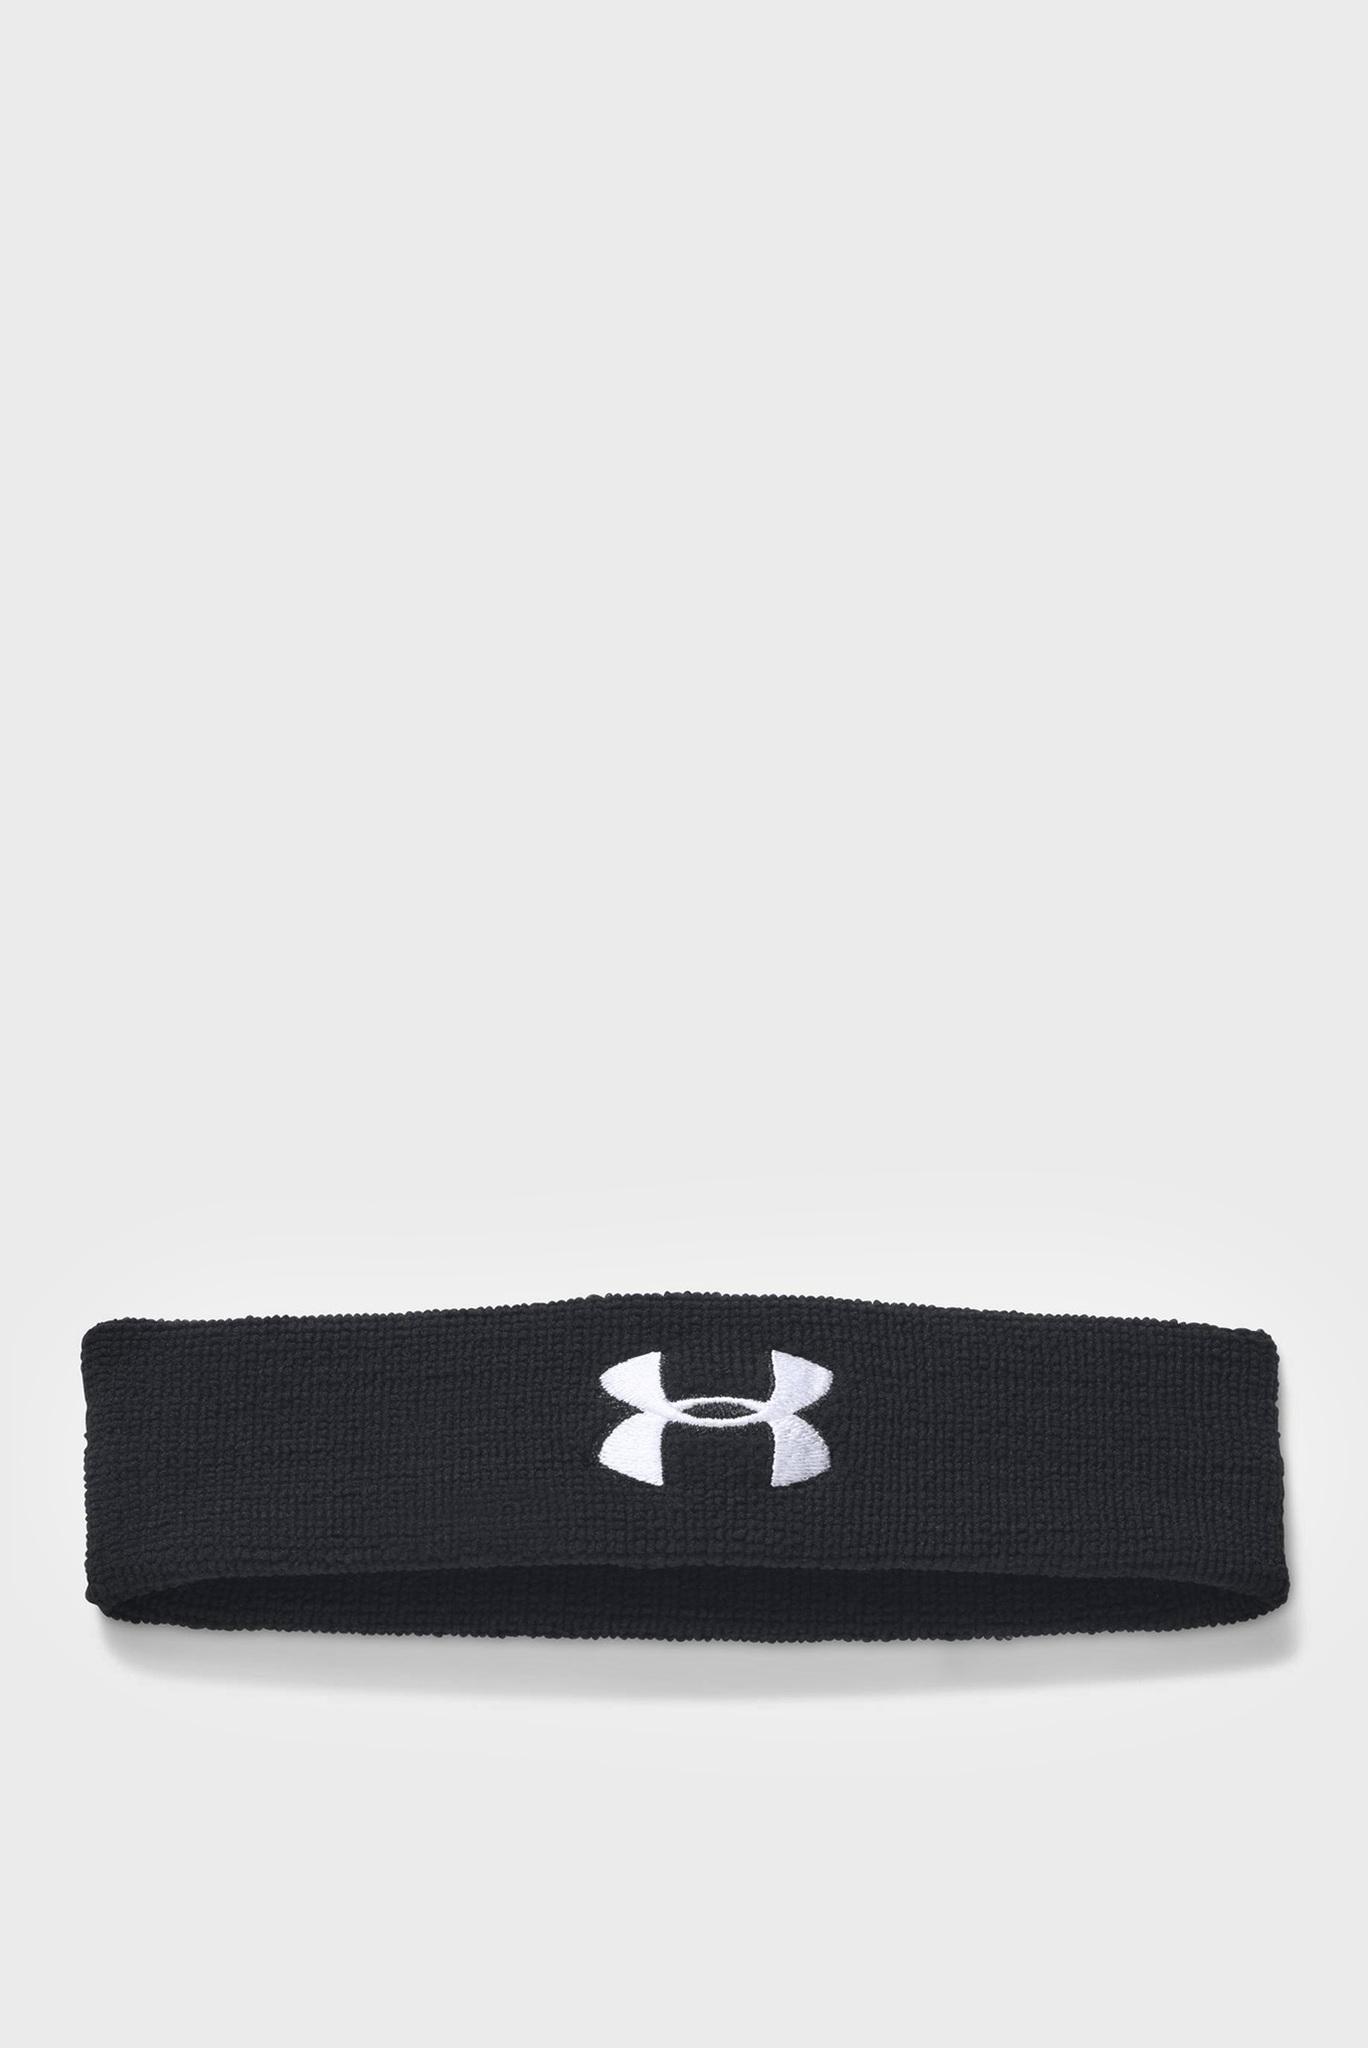 Мужская черная повязка Performance Headband Under Armour